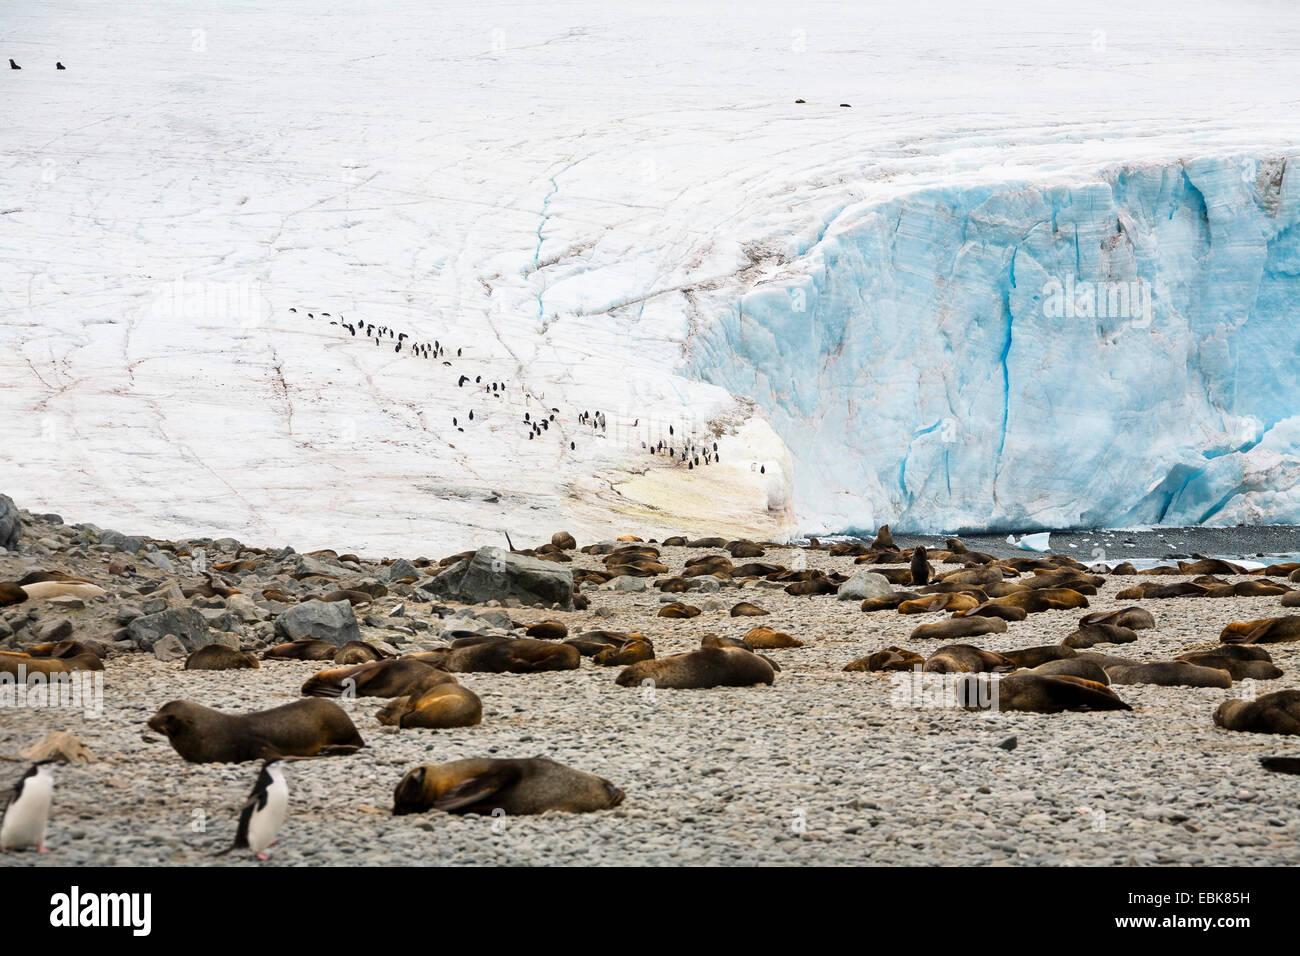 Antarctic fur seal (Arctocephalus gazella), colony at the foot of a glacier, Antarctica, South Orkneys, Laurie Island - Stock Image